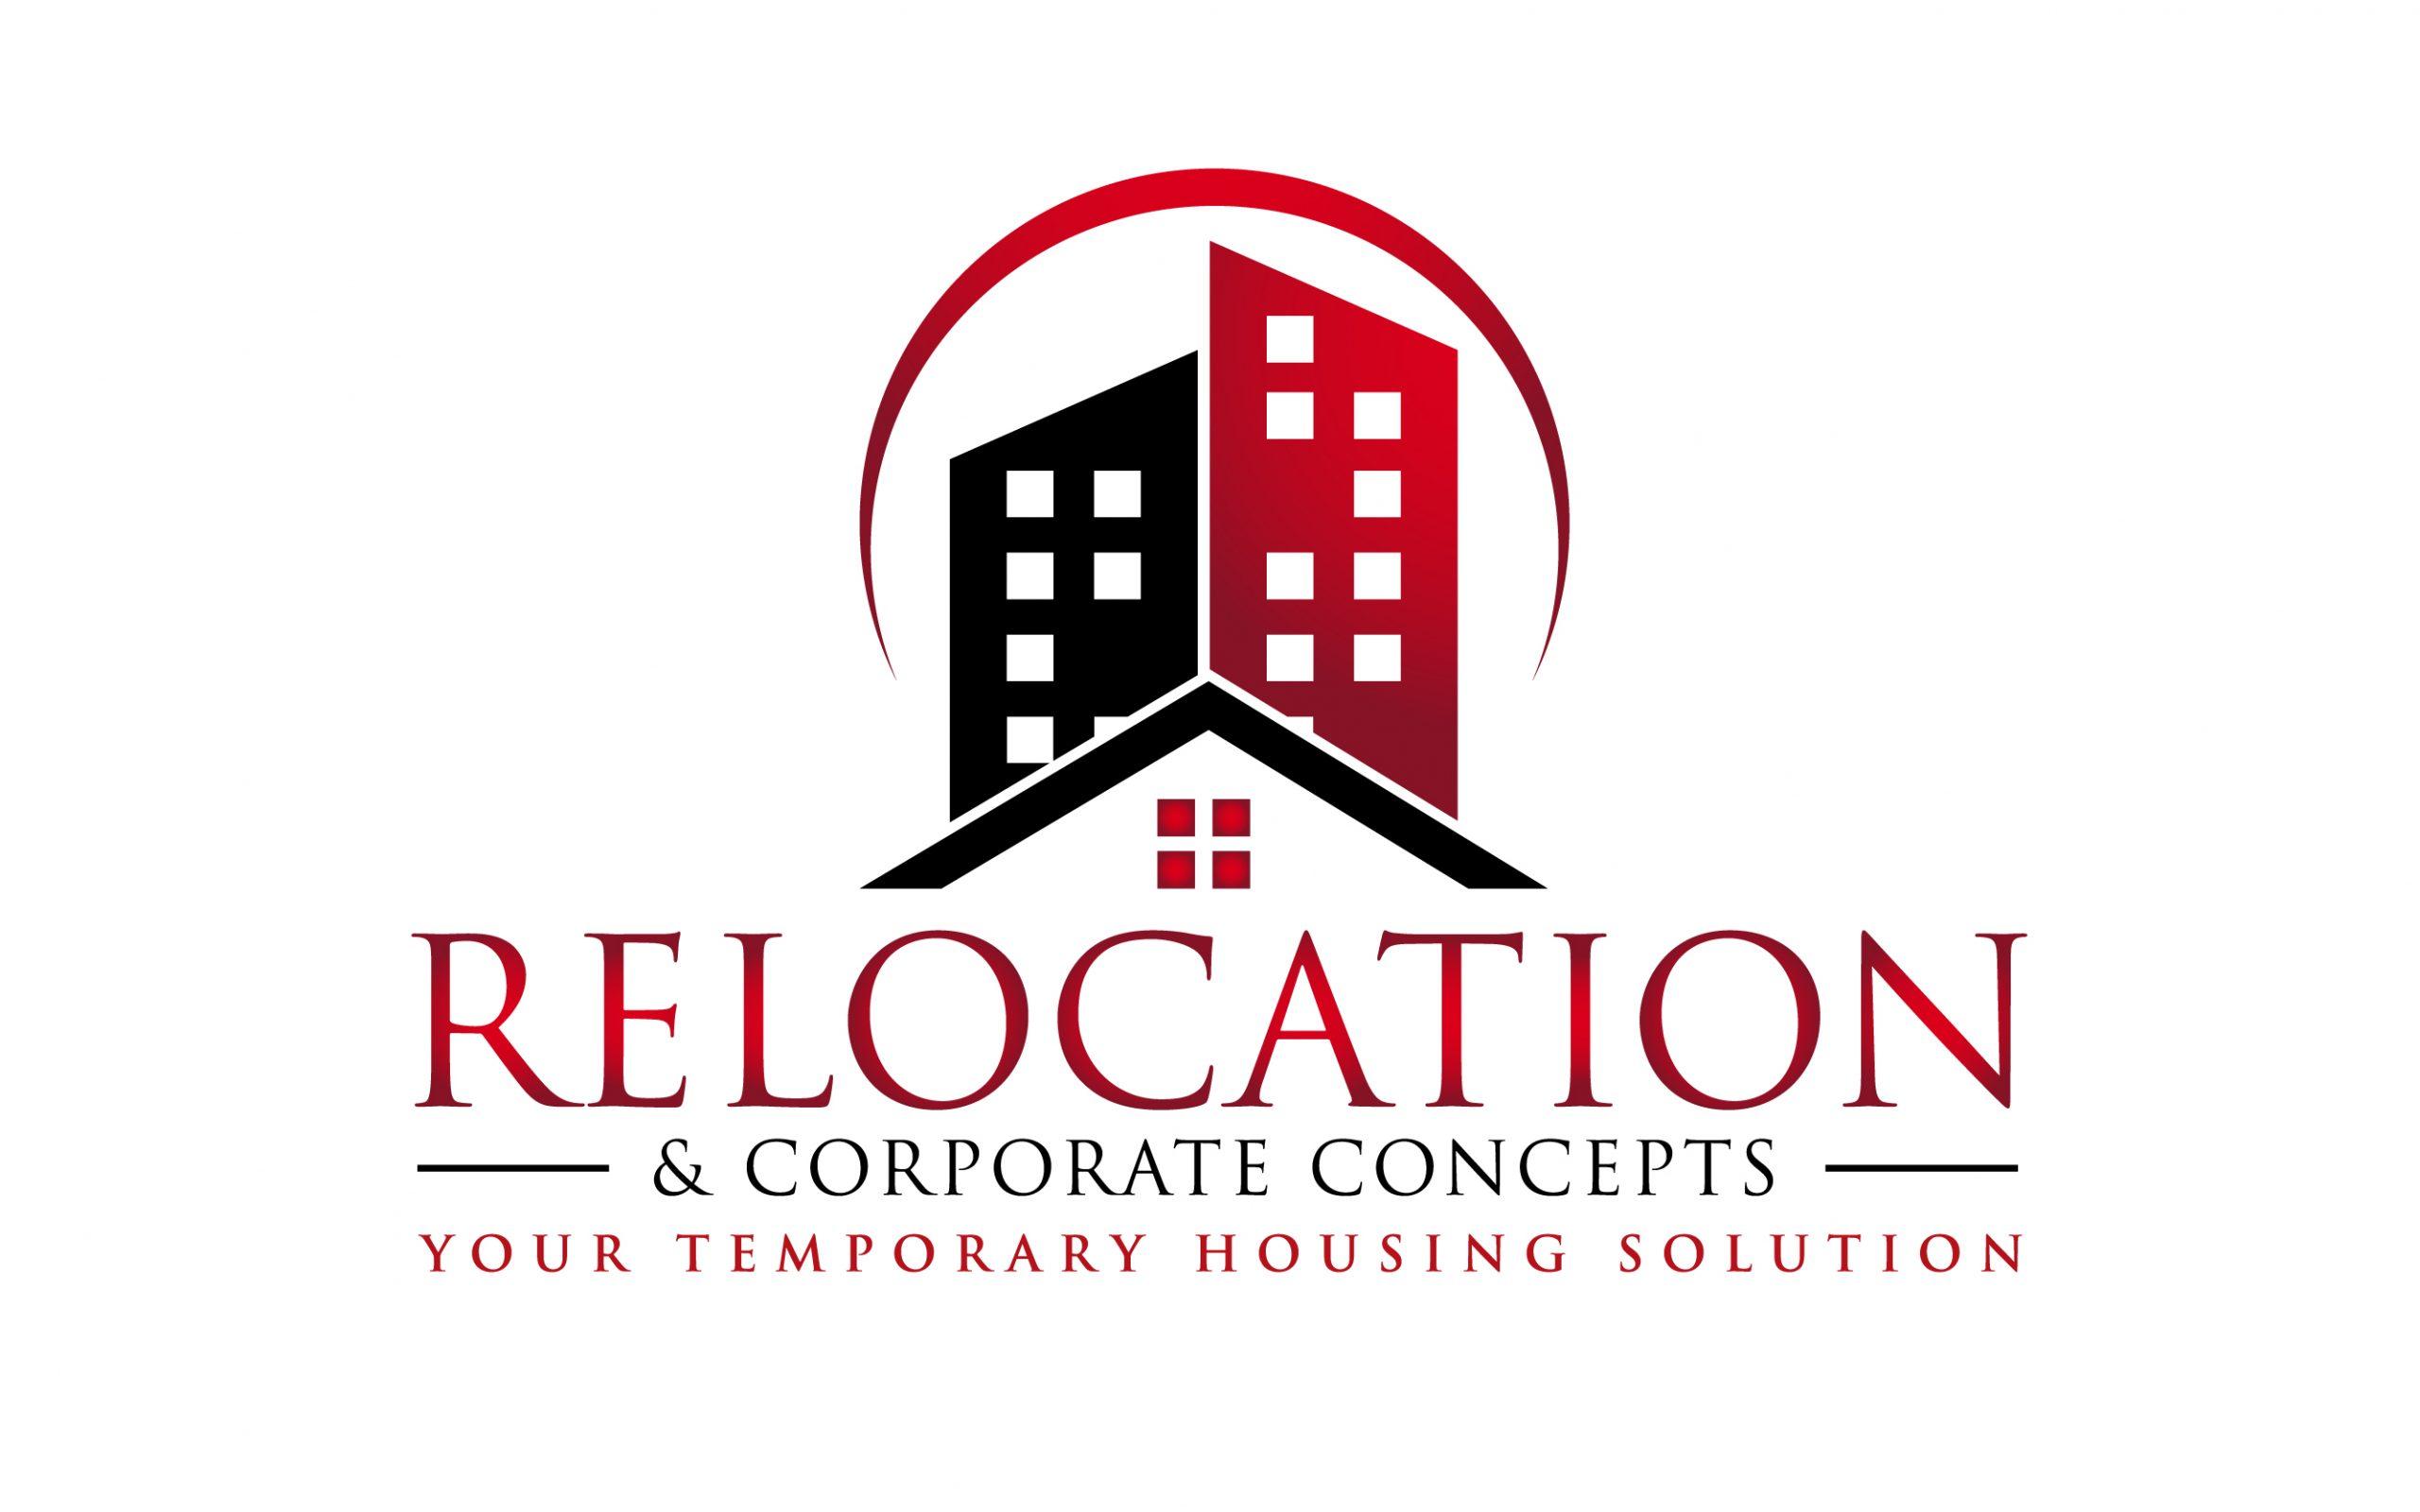 Relocation & Corporate Concepts, Inc.